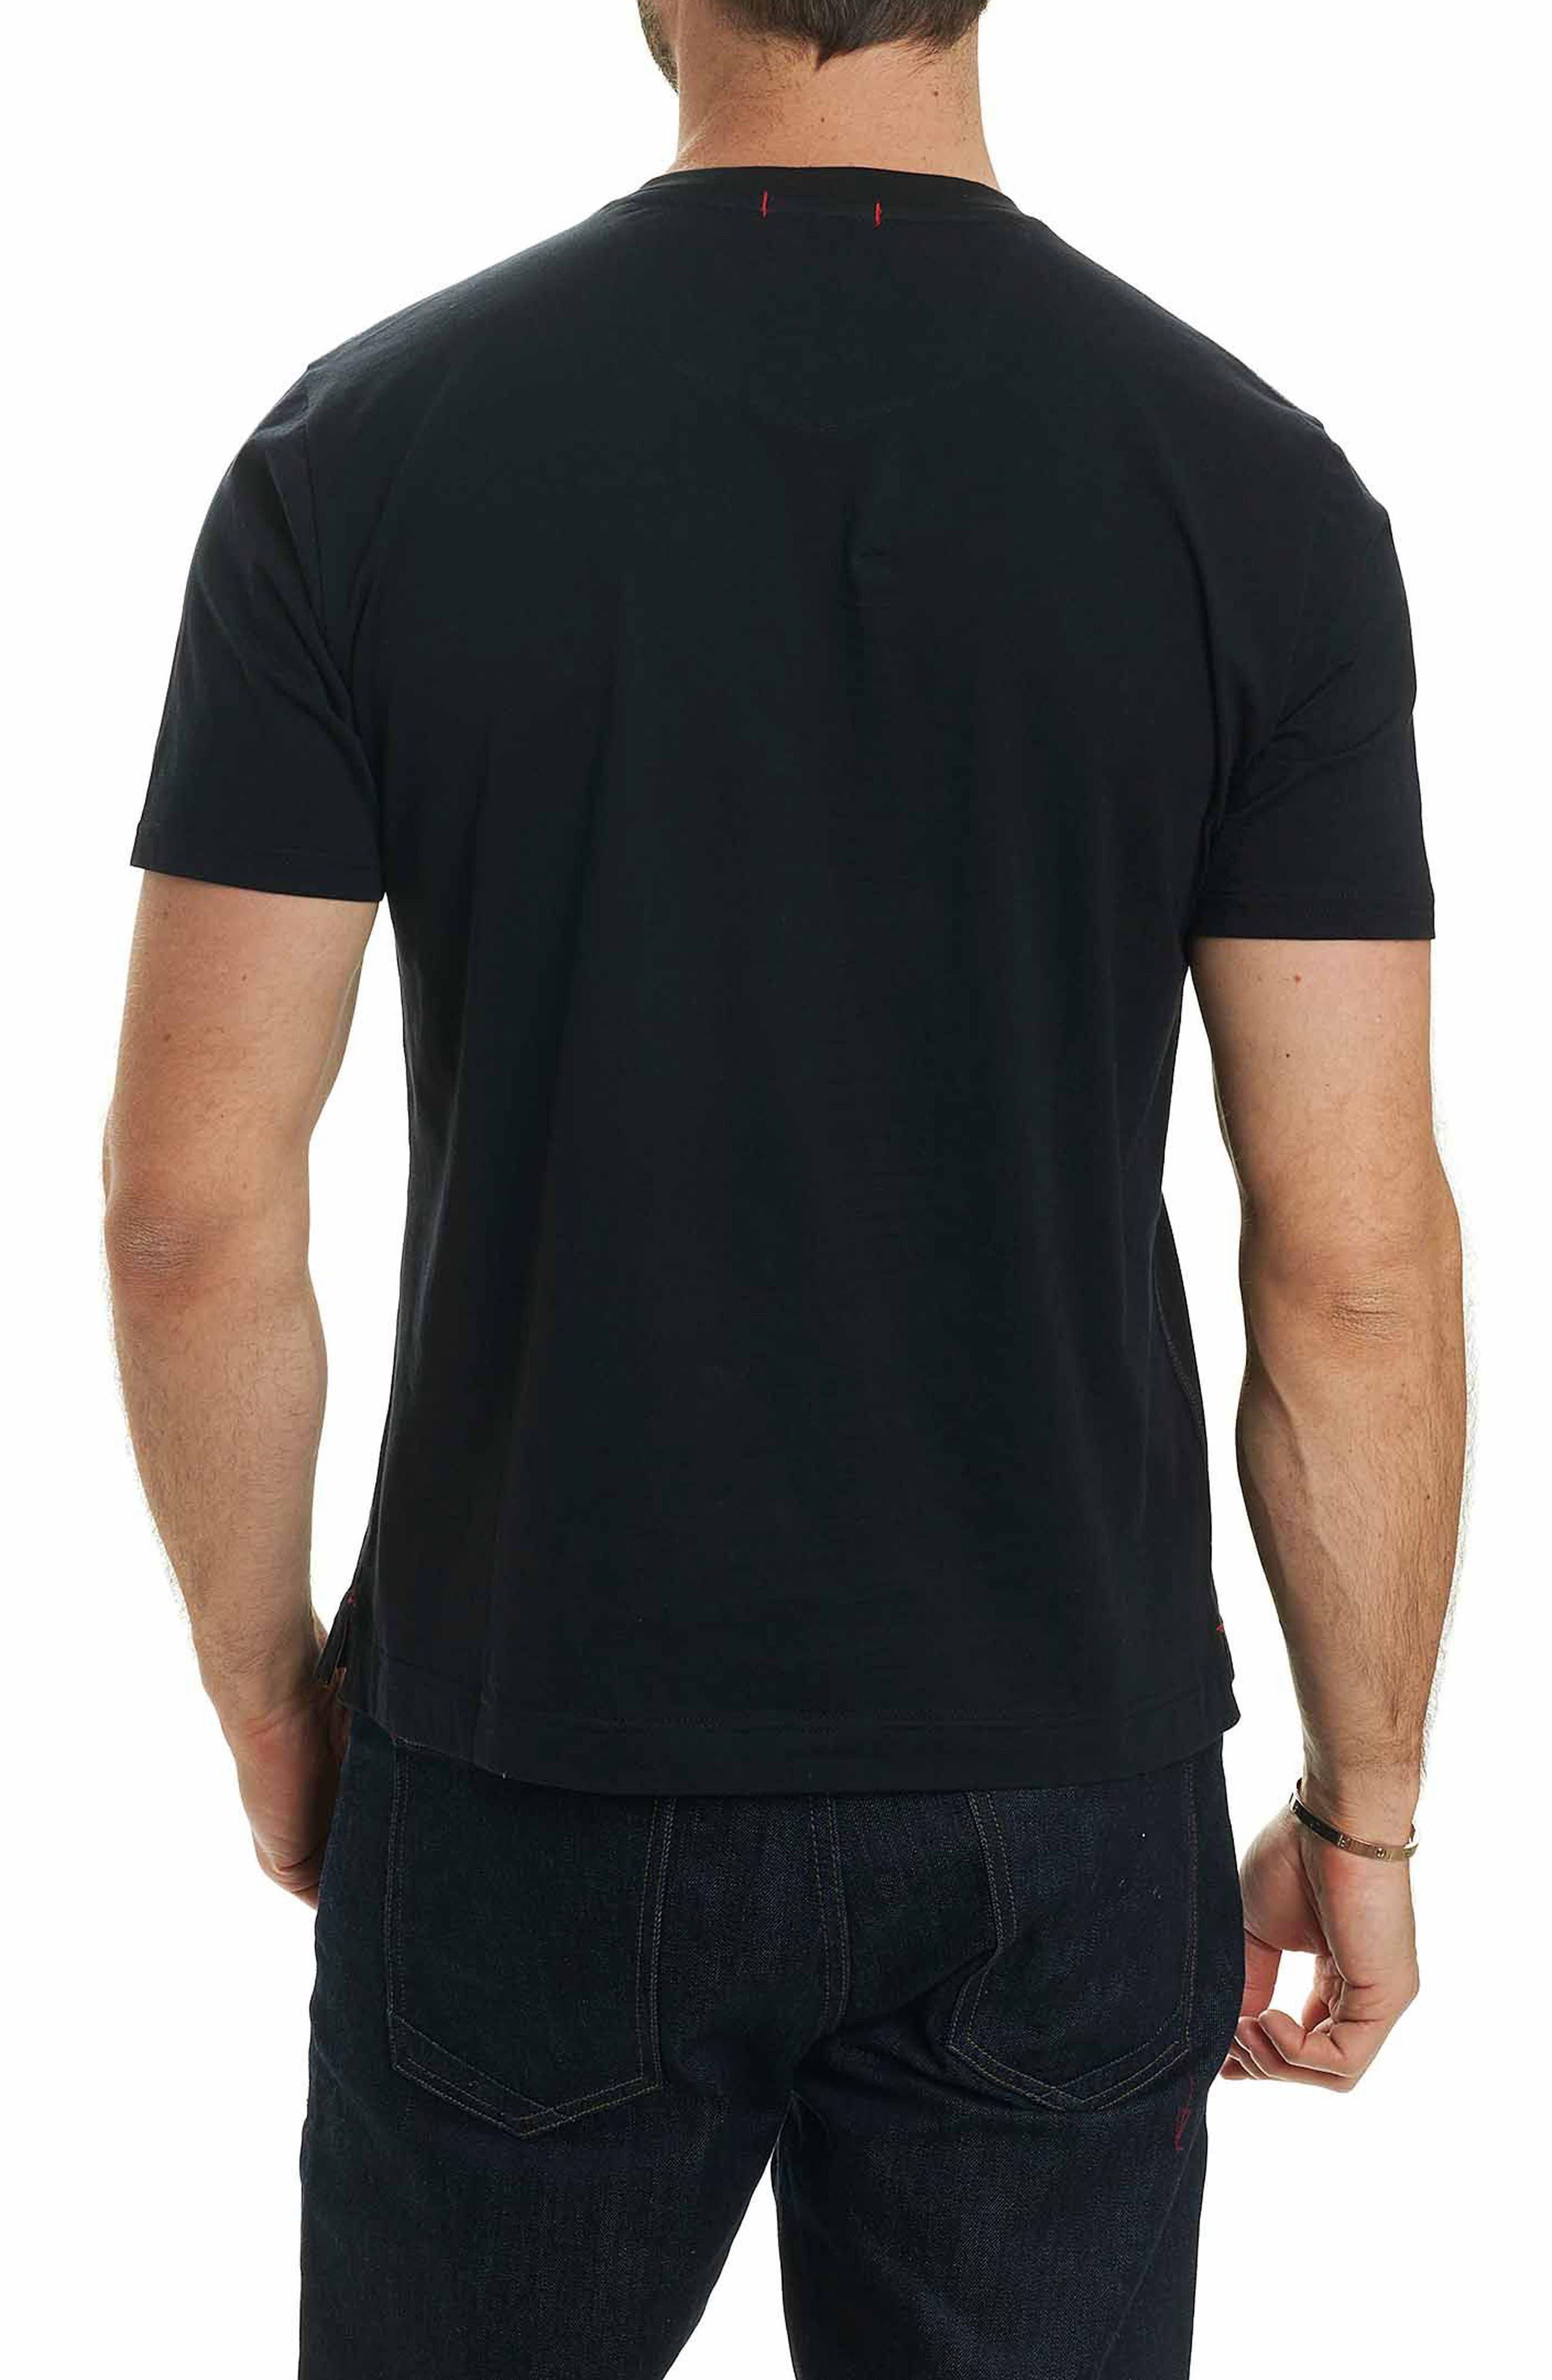 NY Original Graphic T-Shirt,                             Alternate thumbnail 2, color,                             Black